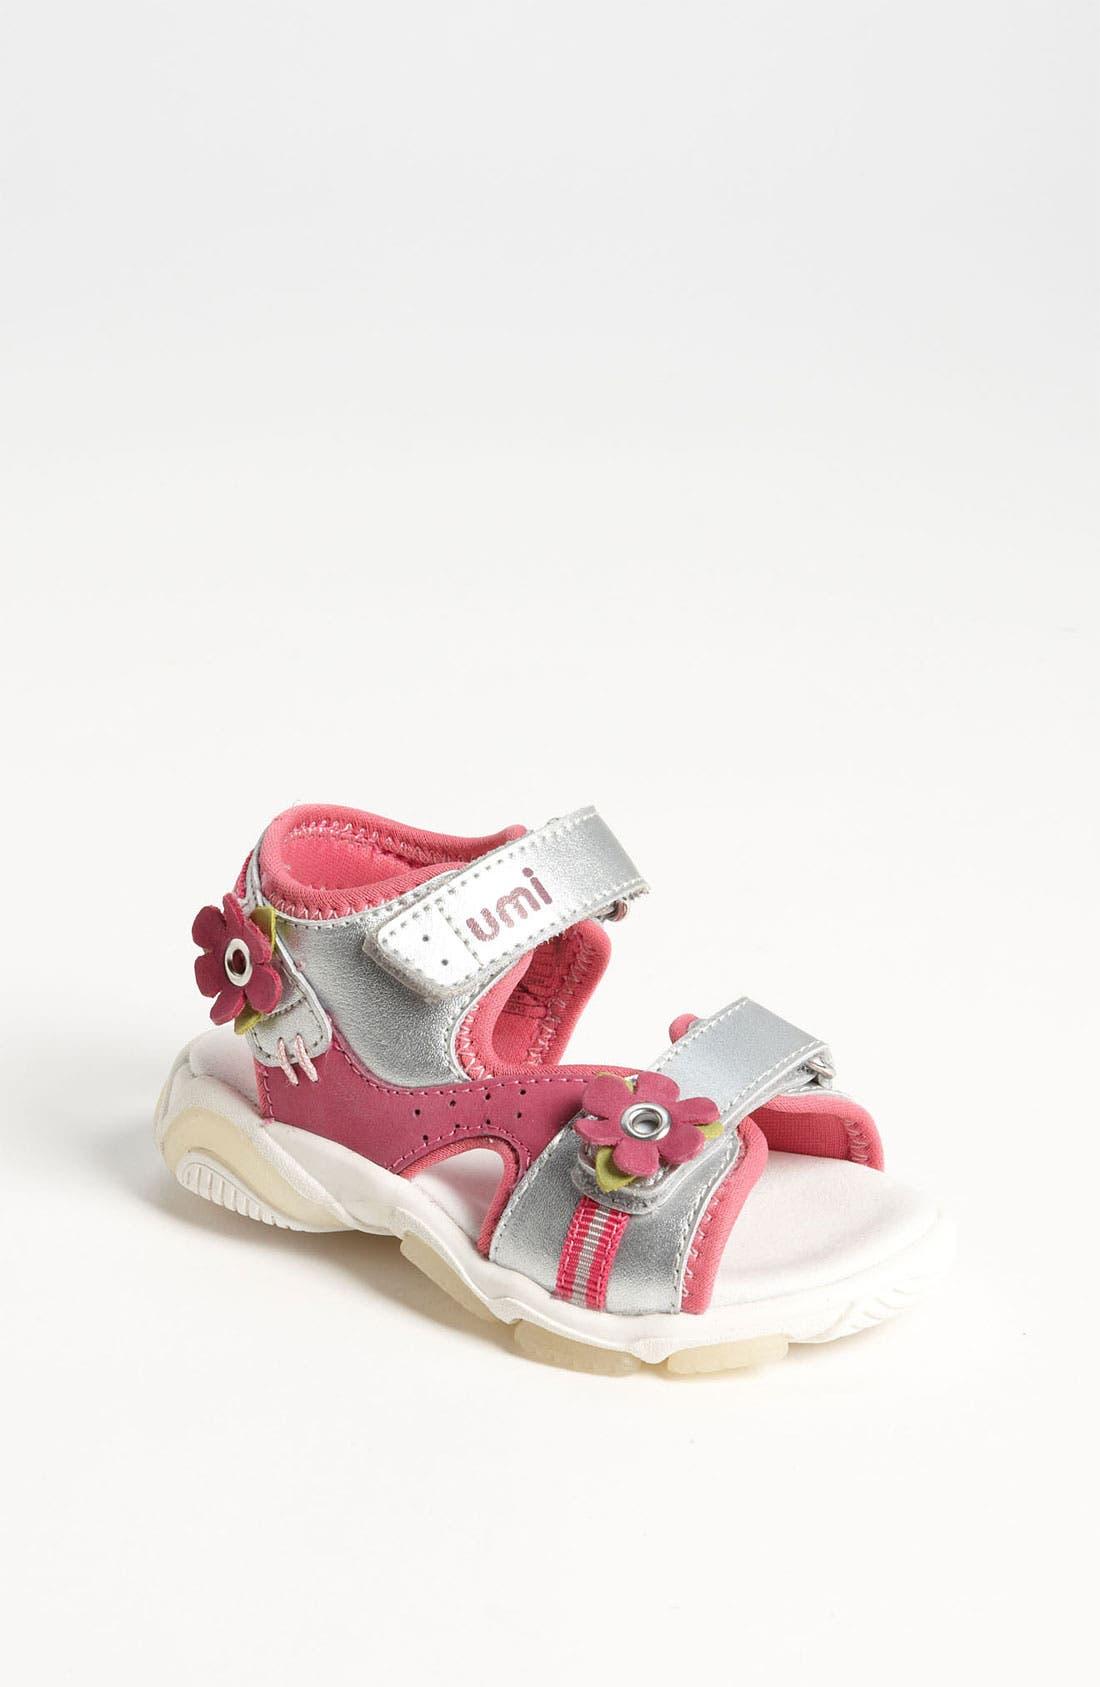 Alternate Image 1 Selected - Umi 'Karolina' Sandal (Toddler, Little Kid & Big Kid)